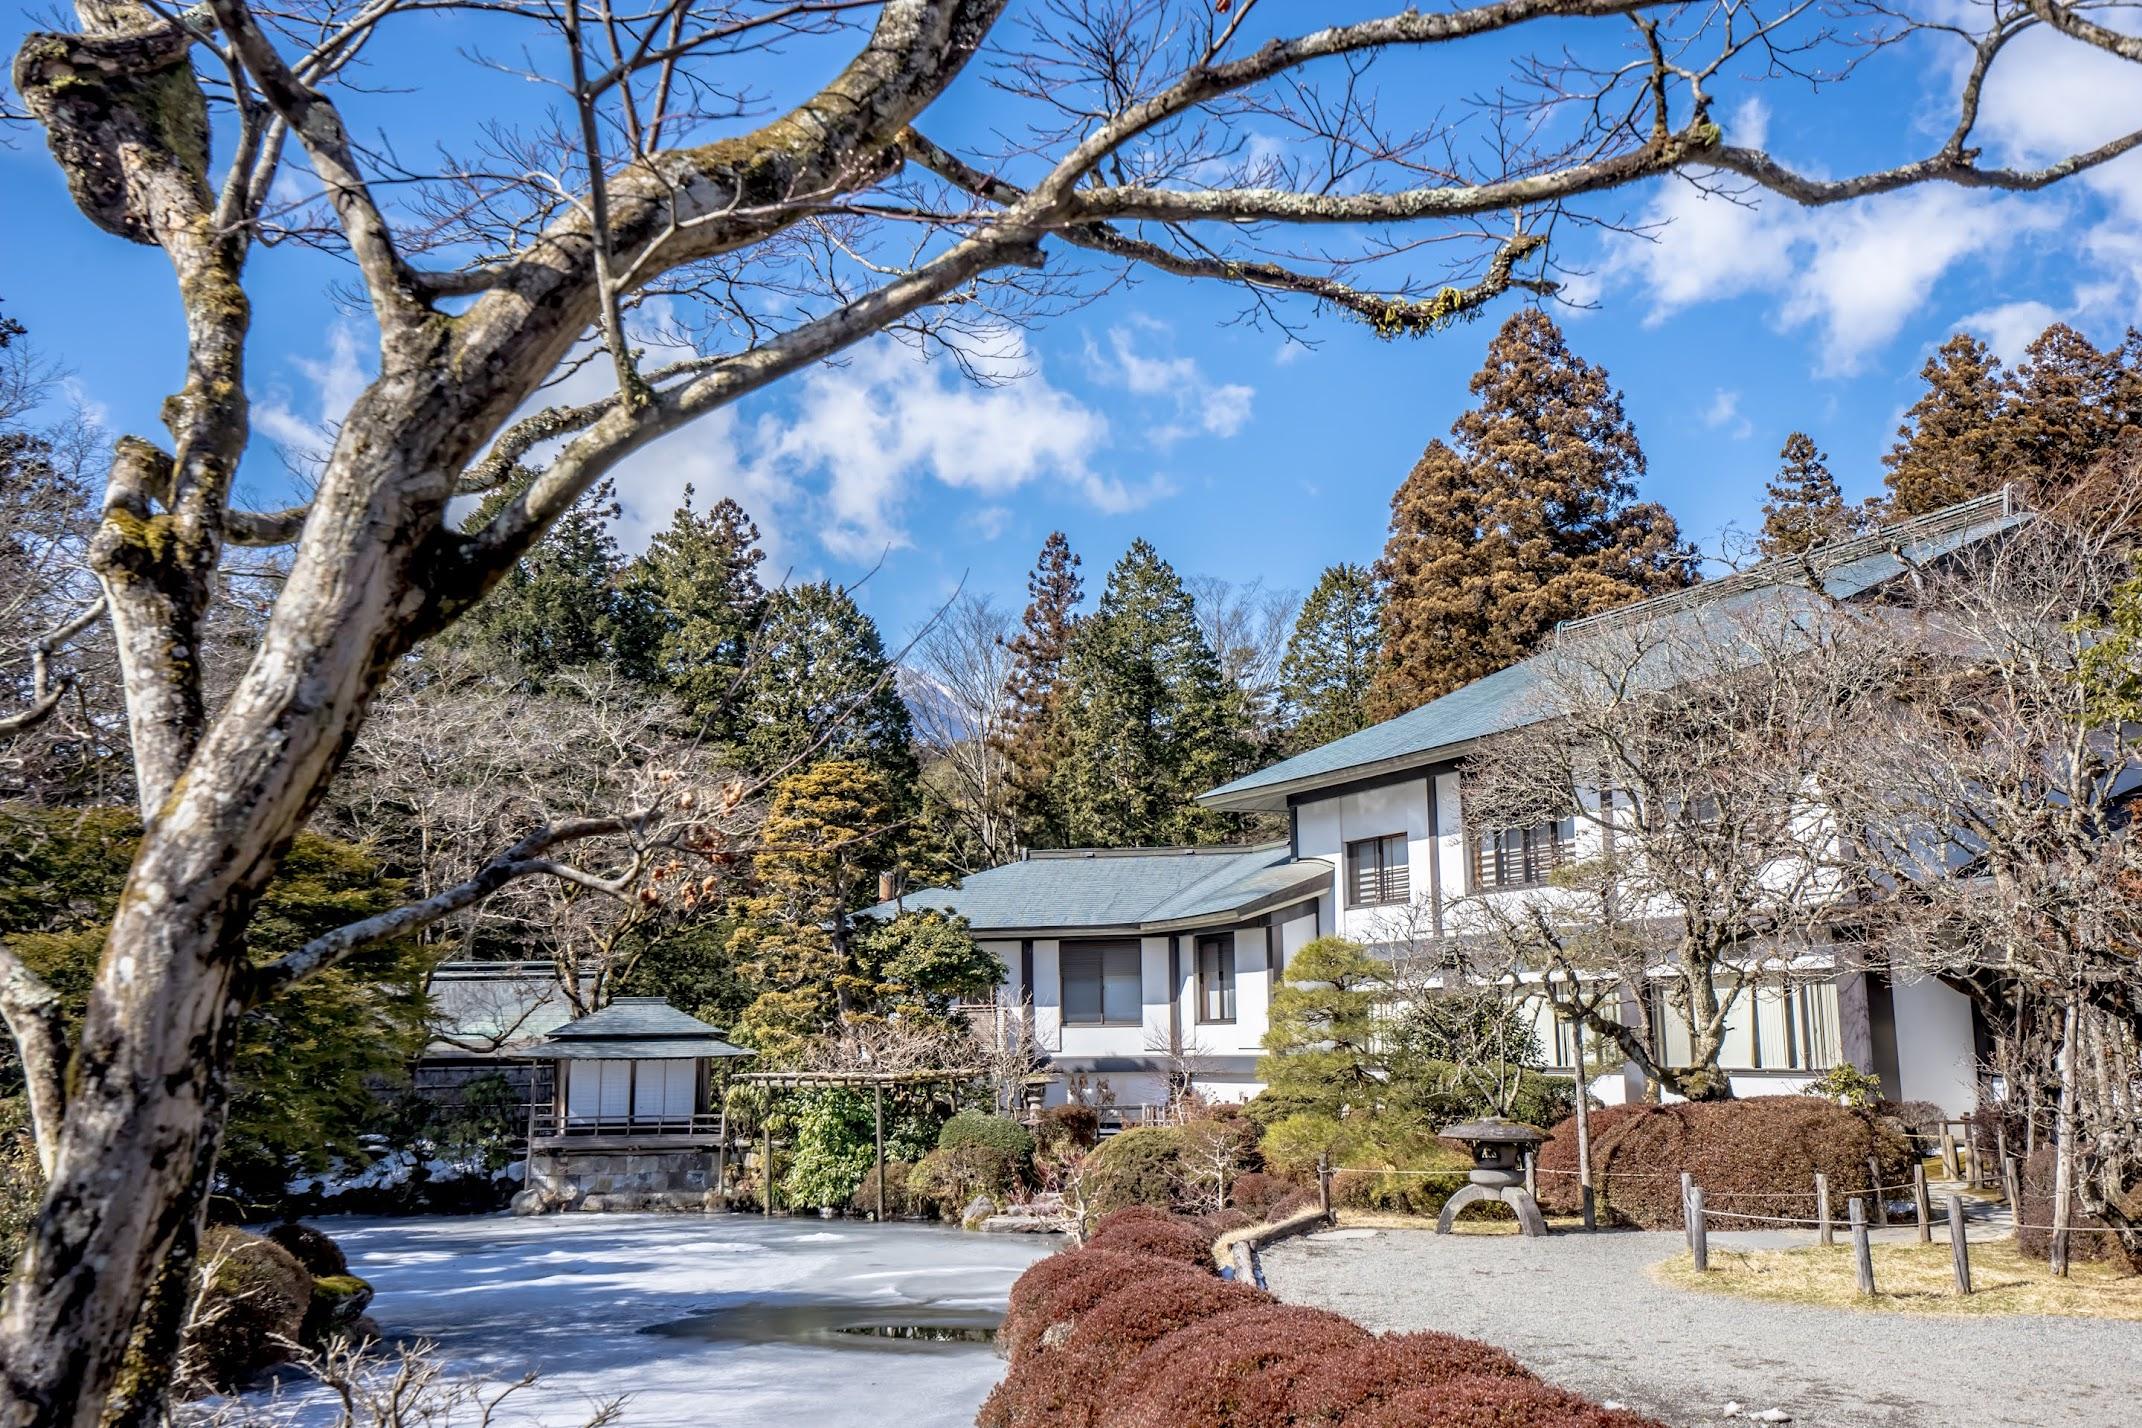 Nikkosan Rinno-Ji Temple Shoyoen garden3